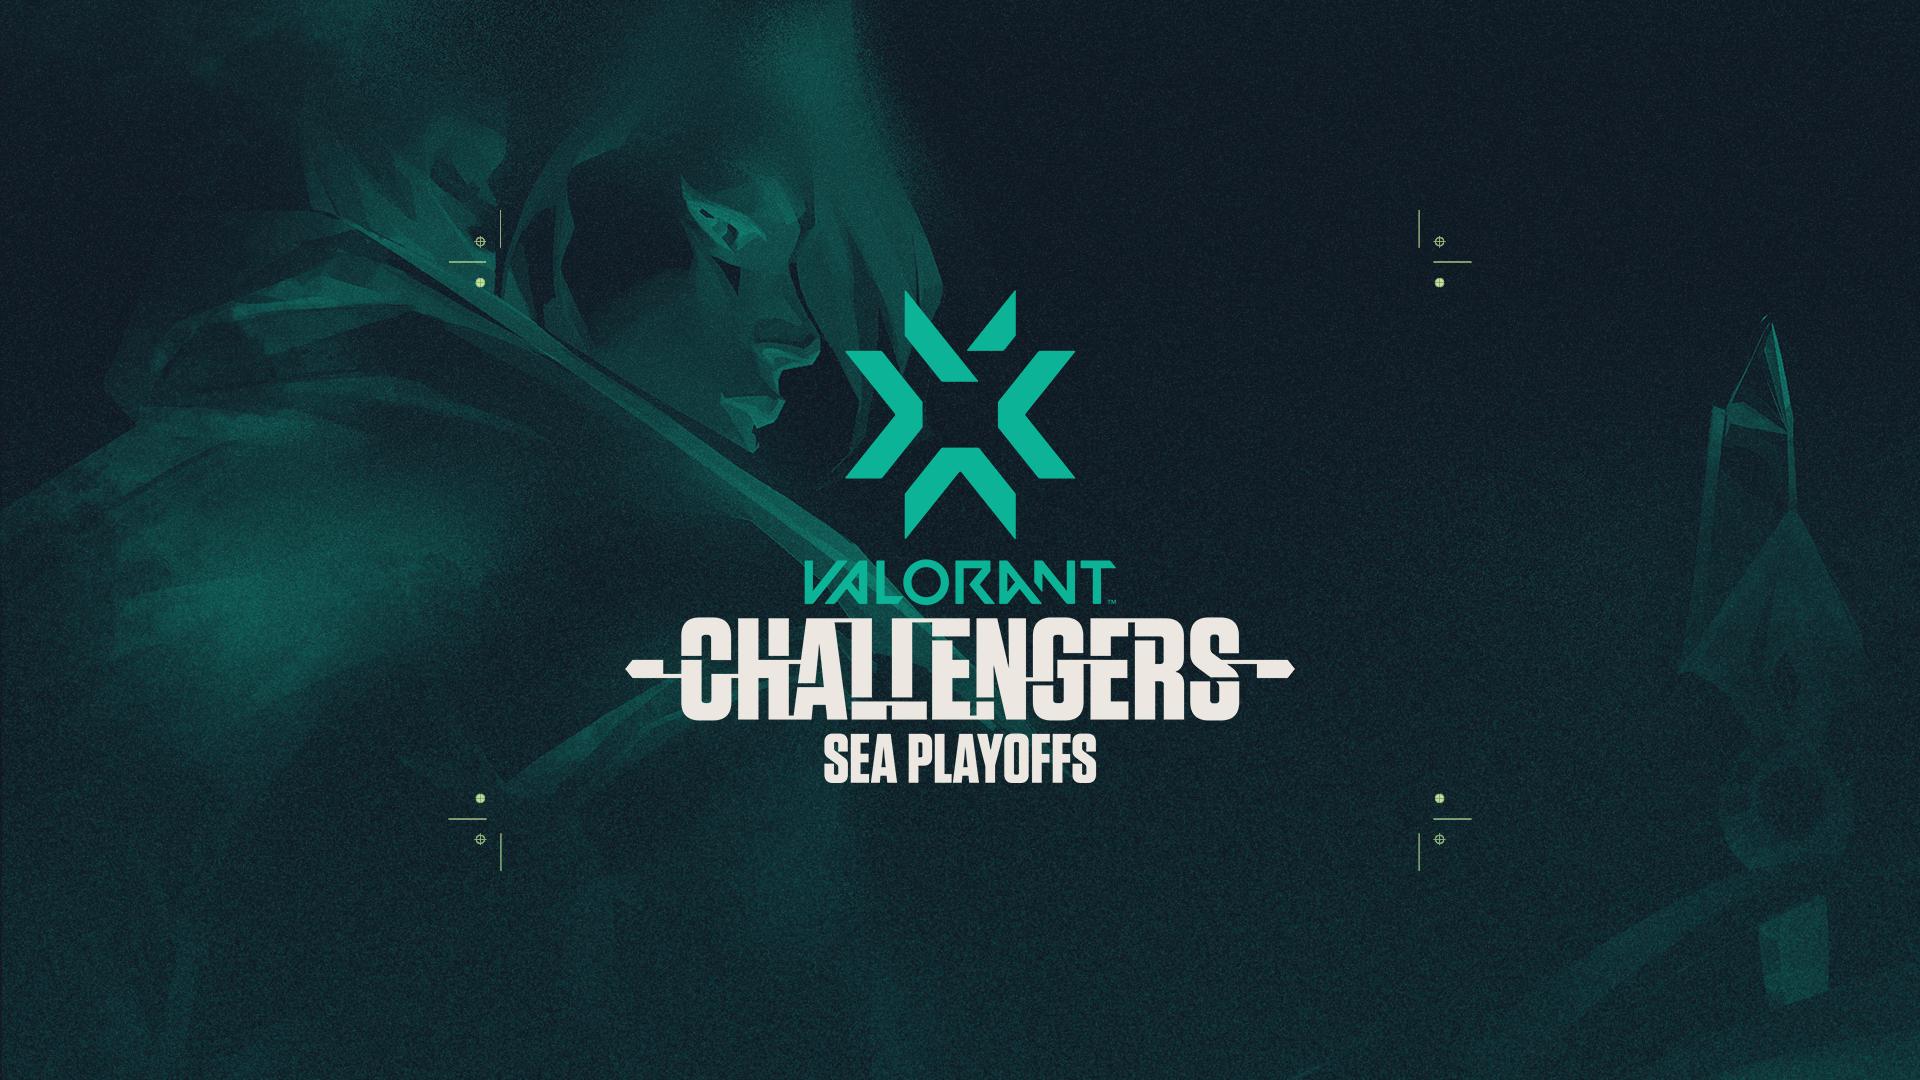 VCT第三階段東南亞挑戰賽季後賽簡介